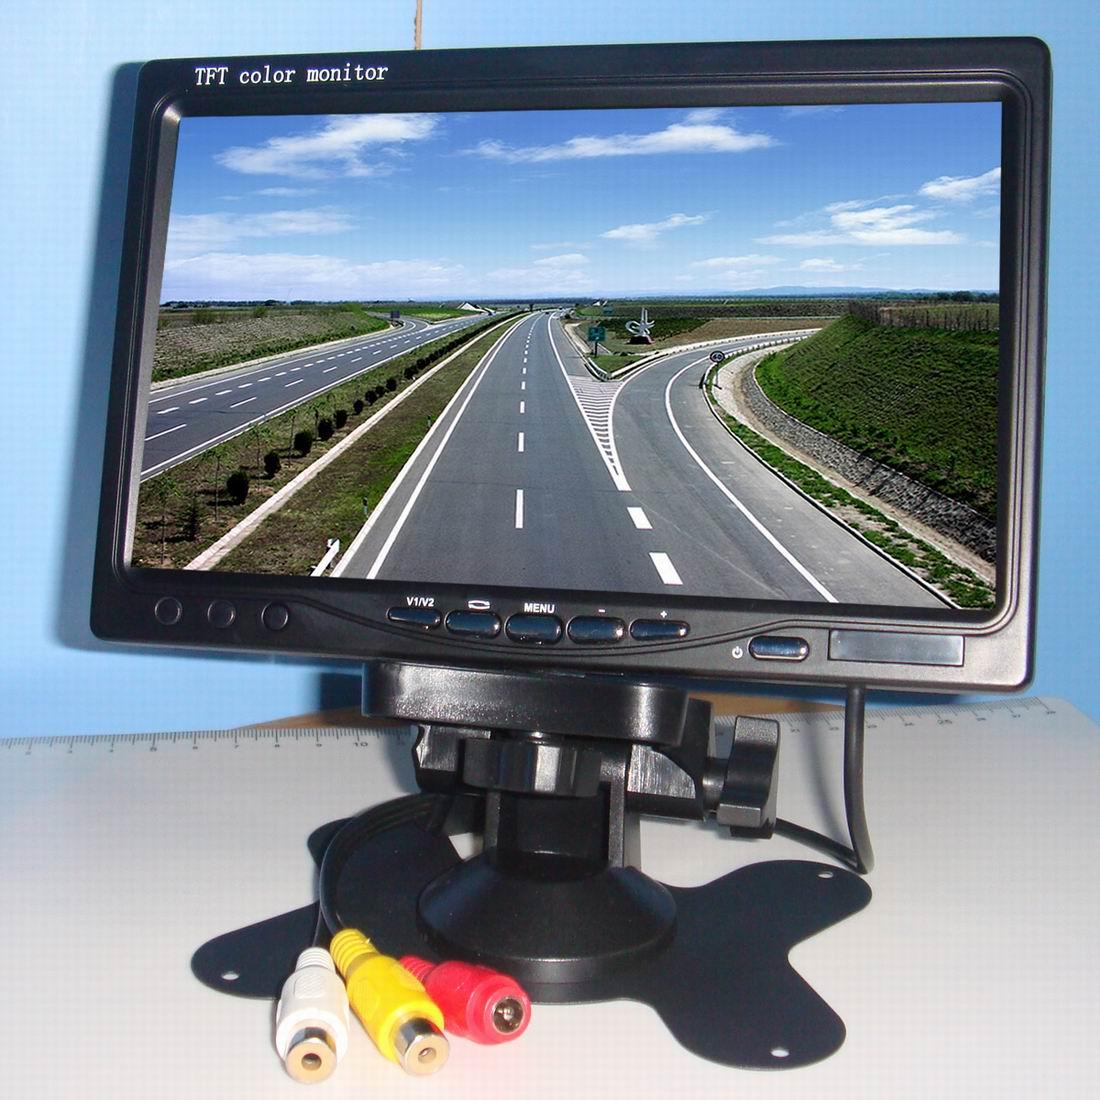 Lcd монитор для улицы